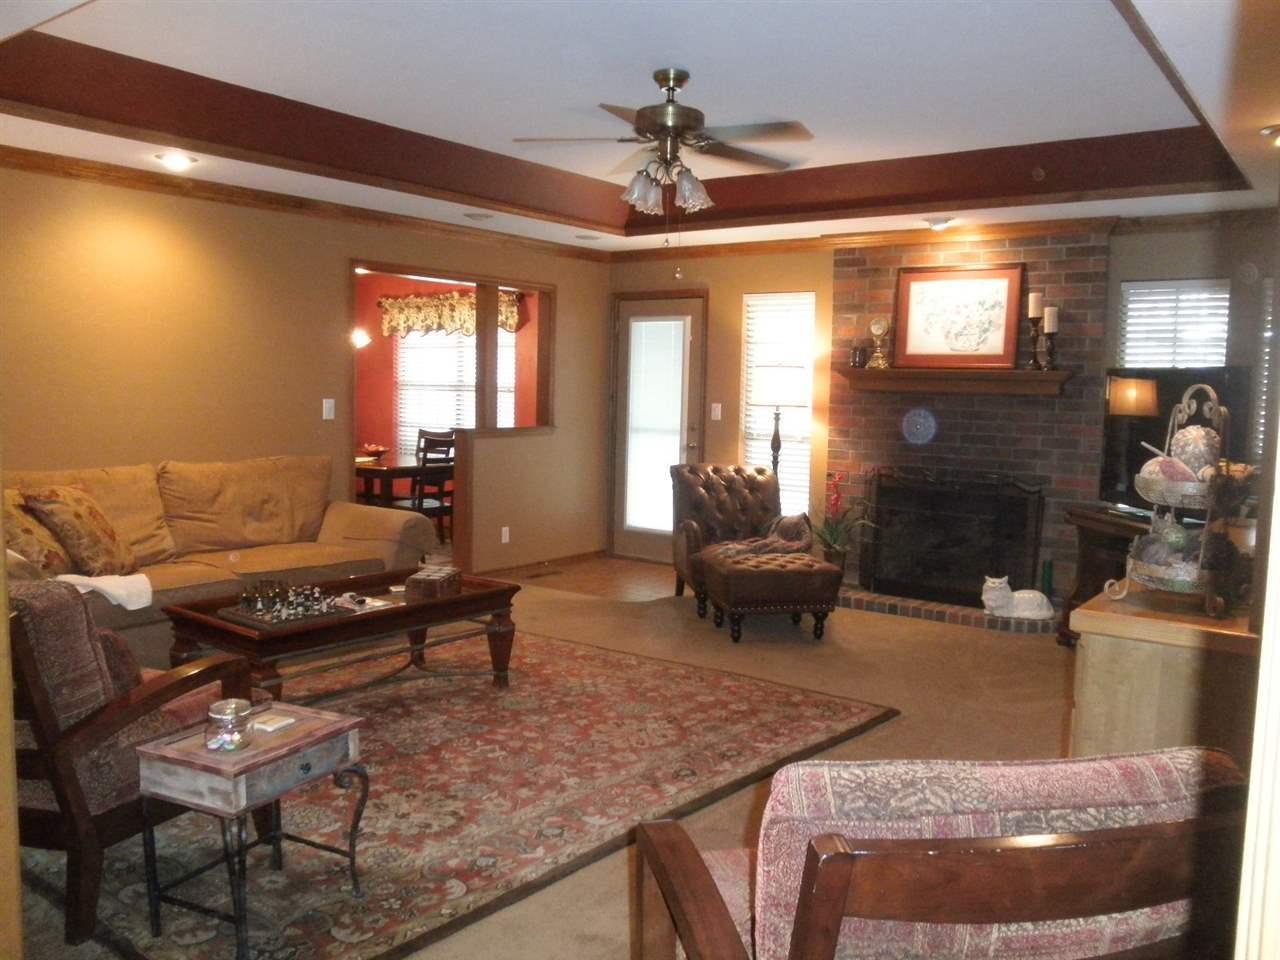 Sold Intraoffice W/MLS | 2800 Green Meadow Ponca City, OK 74604 2